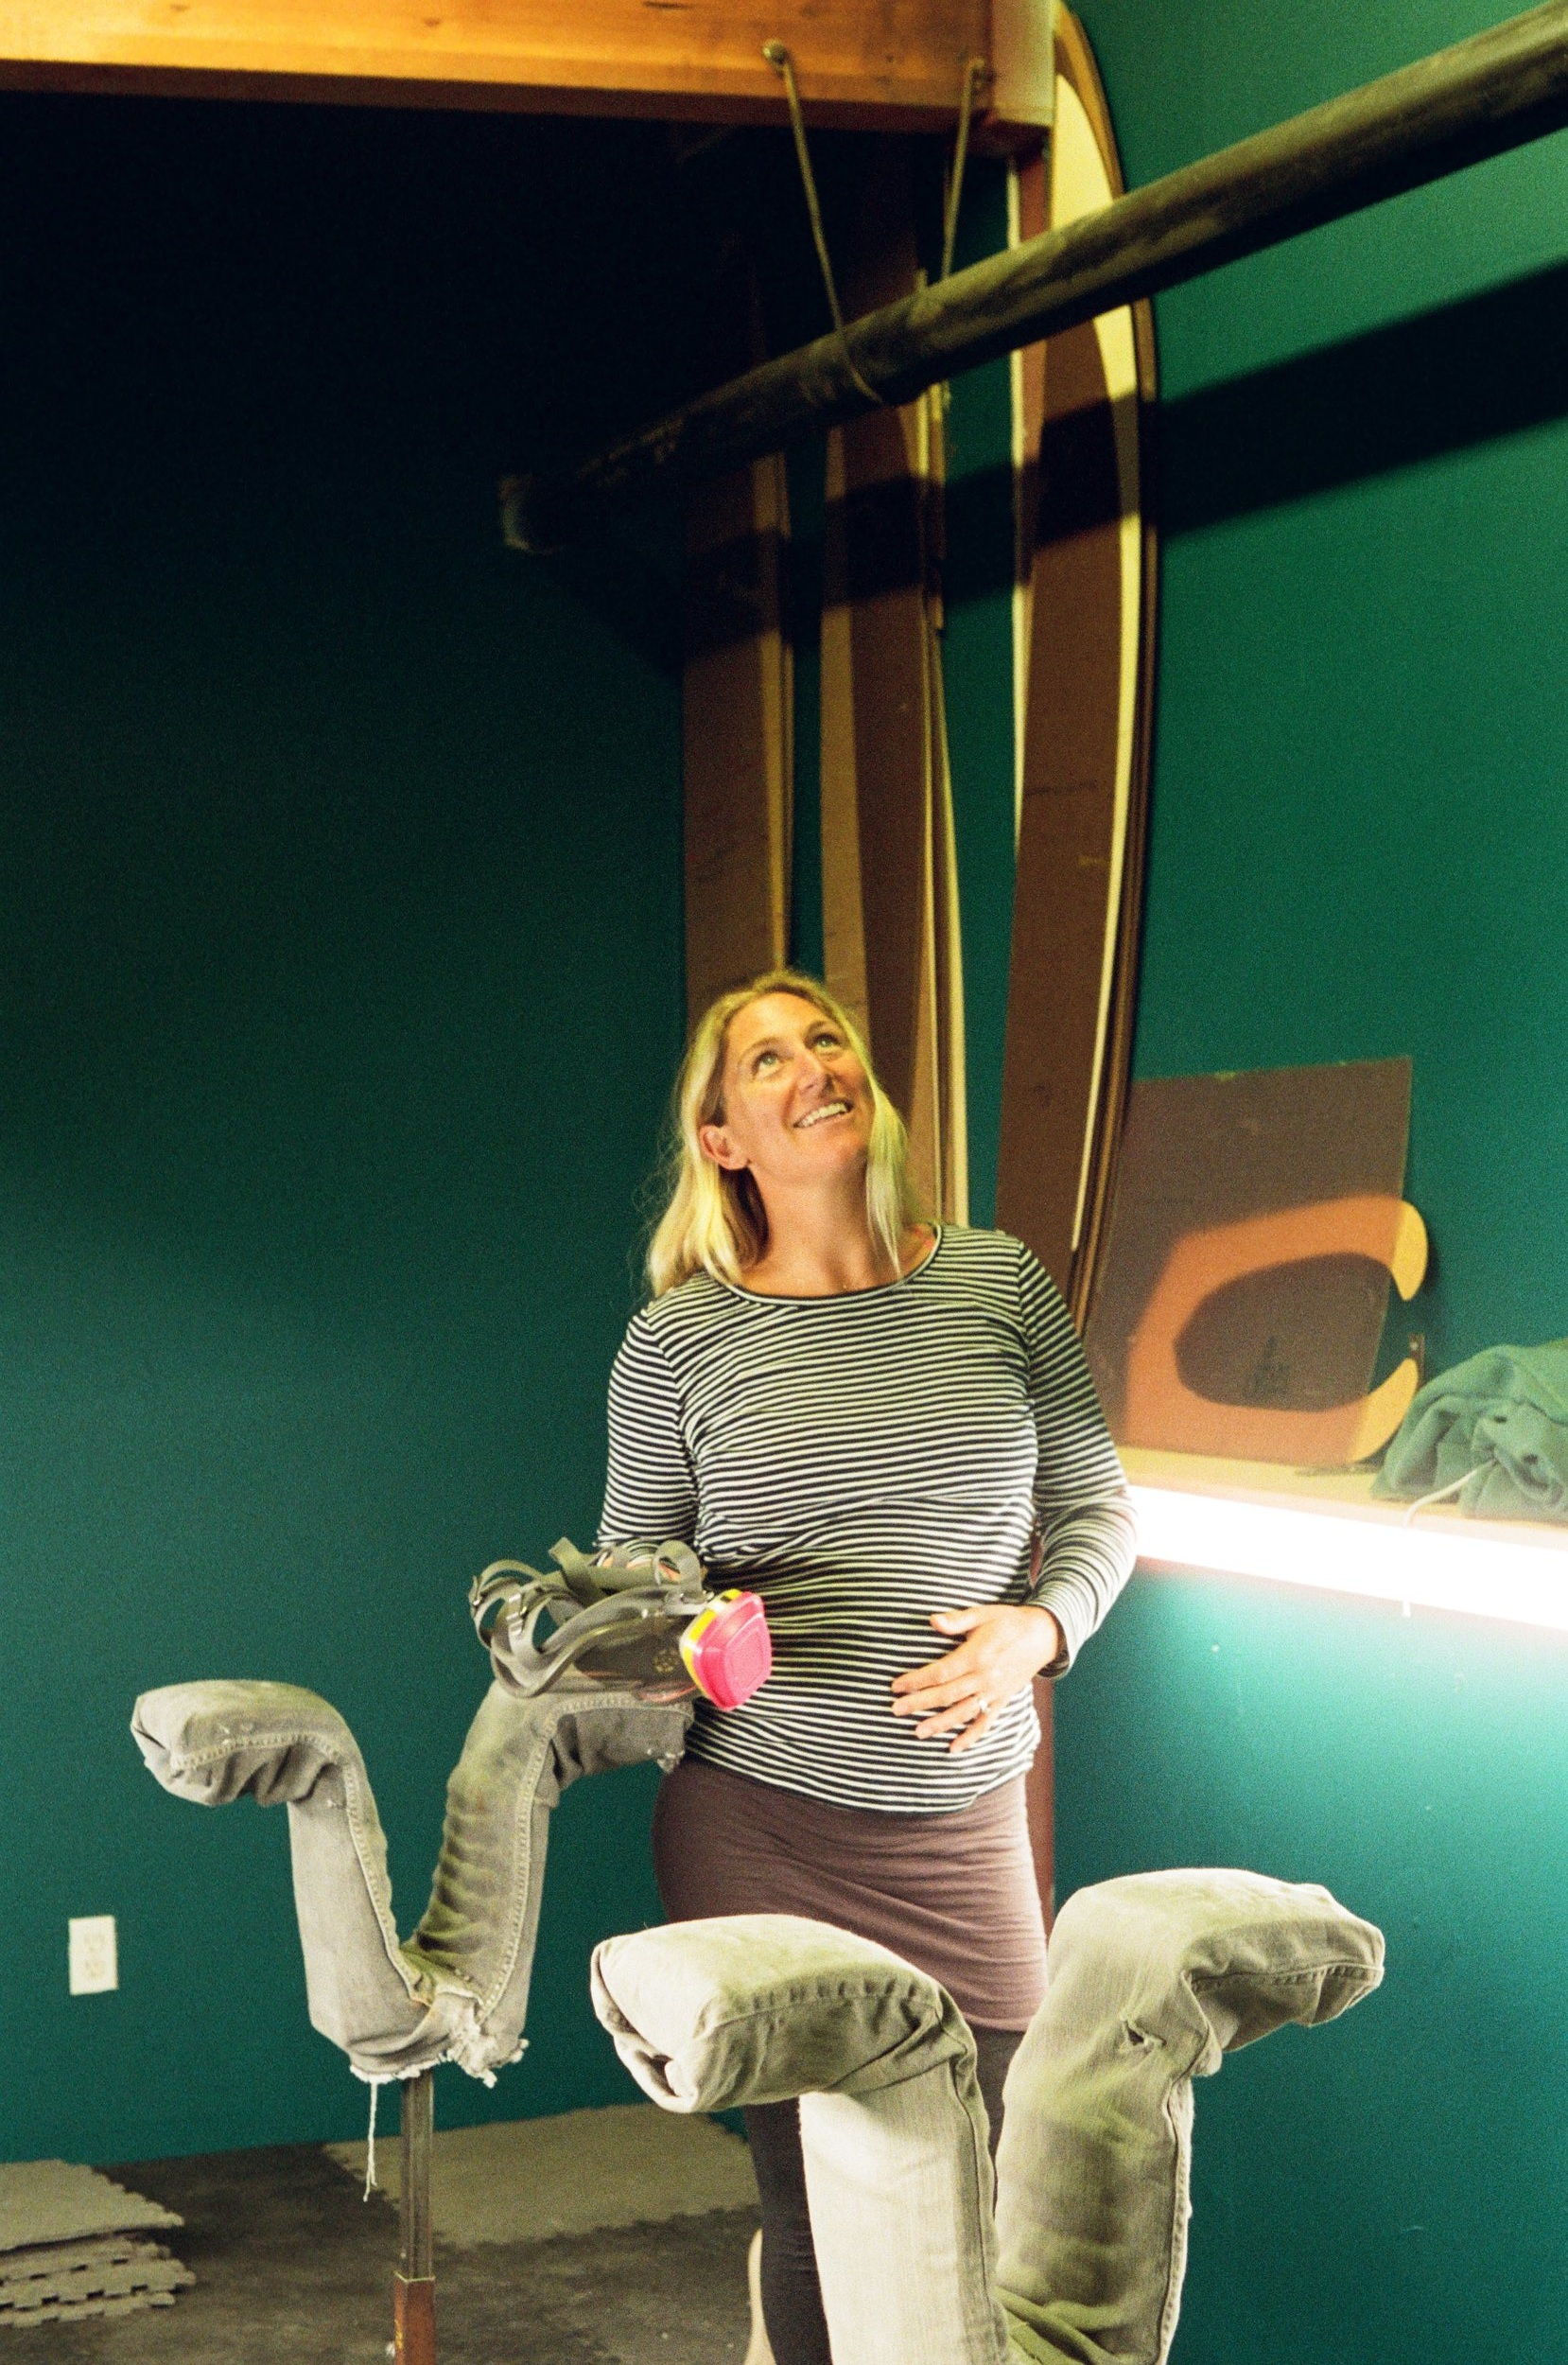 Ashley Lloyd in her shaping bay. (Santa Cruz, California)